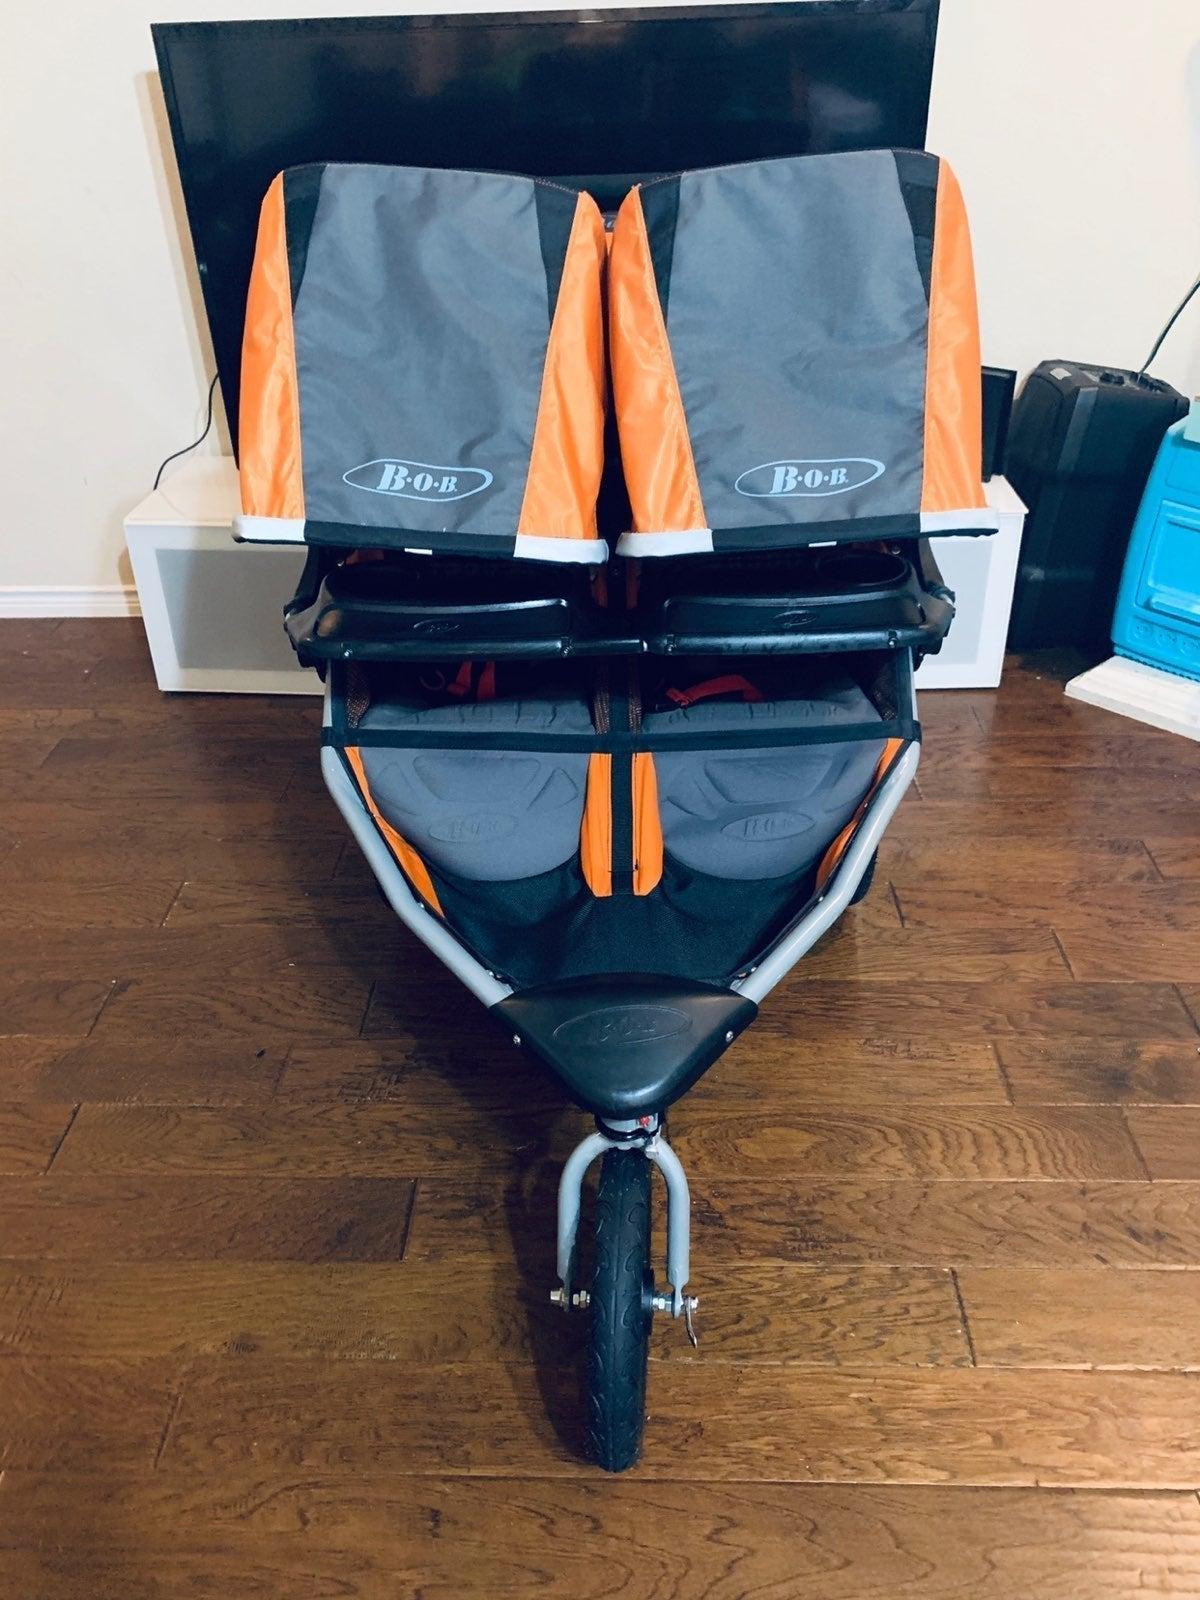 ⭐️ 2014 Bob Revolution Double Stroller